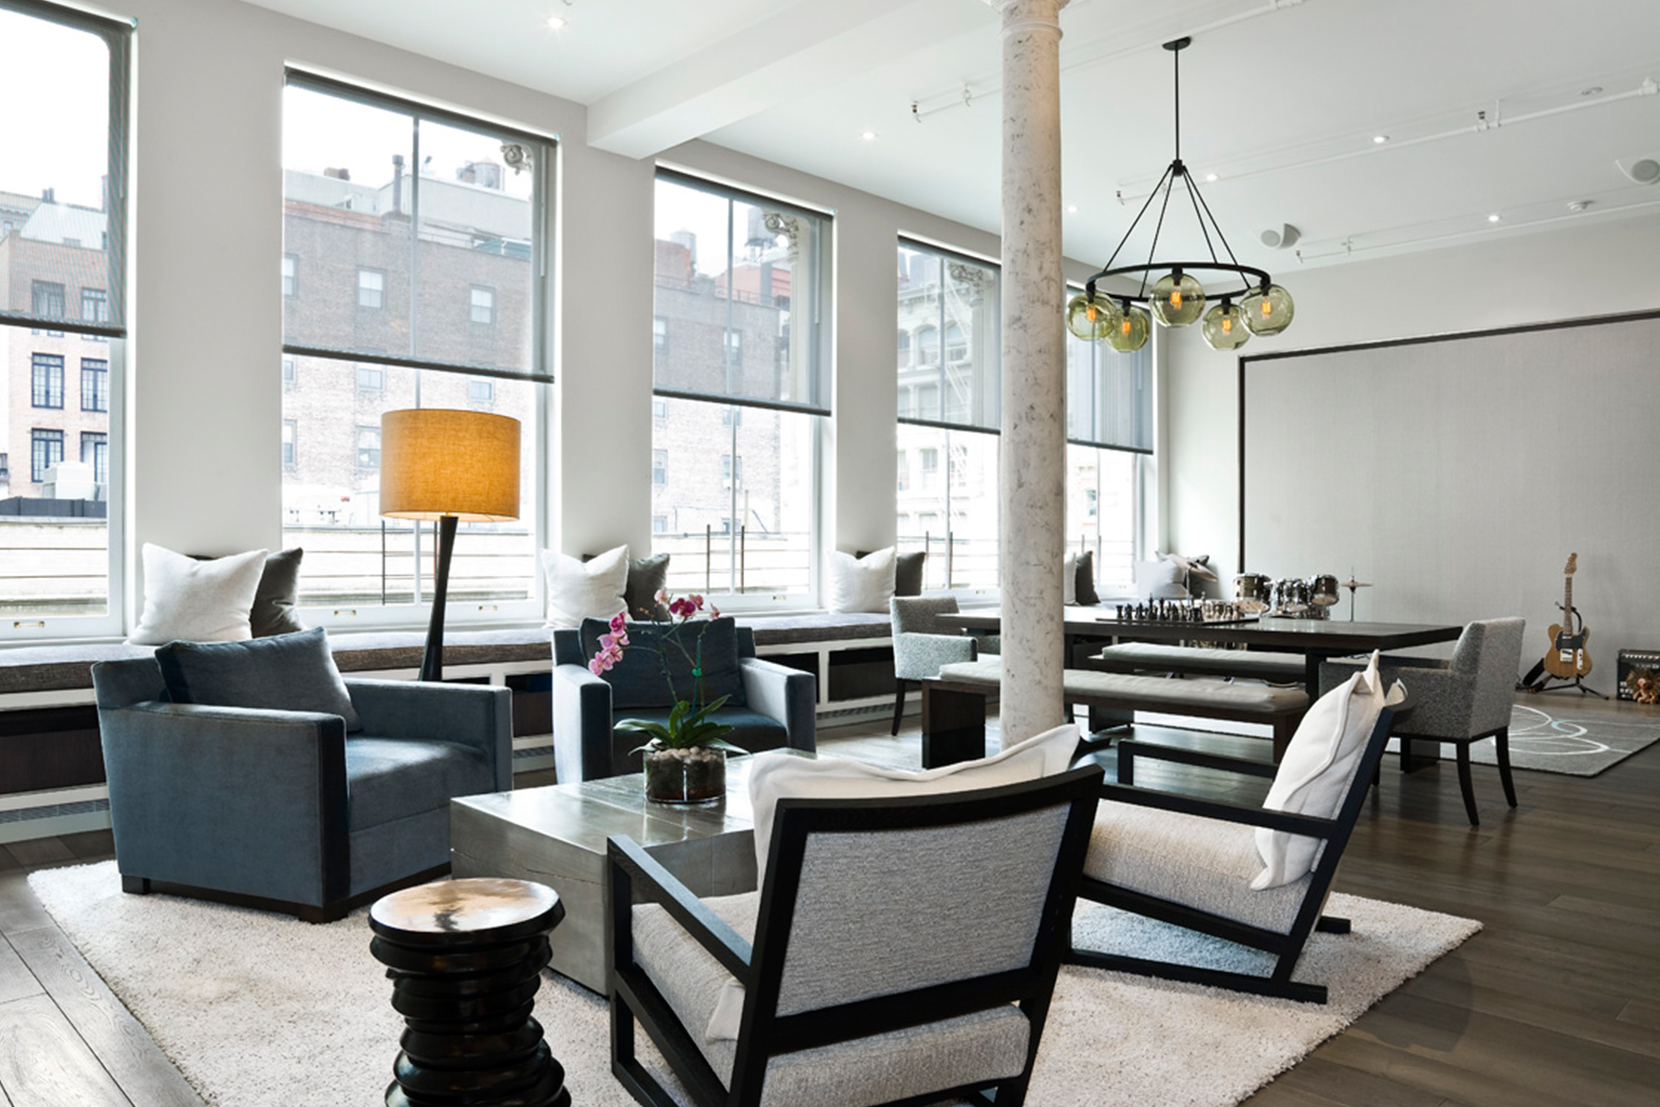 Modern Glass Living Room Lighting - Smoke Solitaire Chandelier